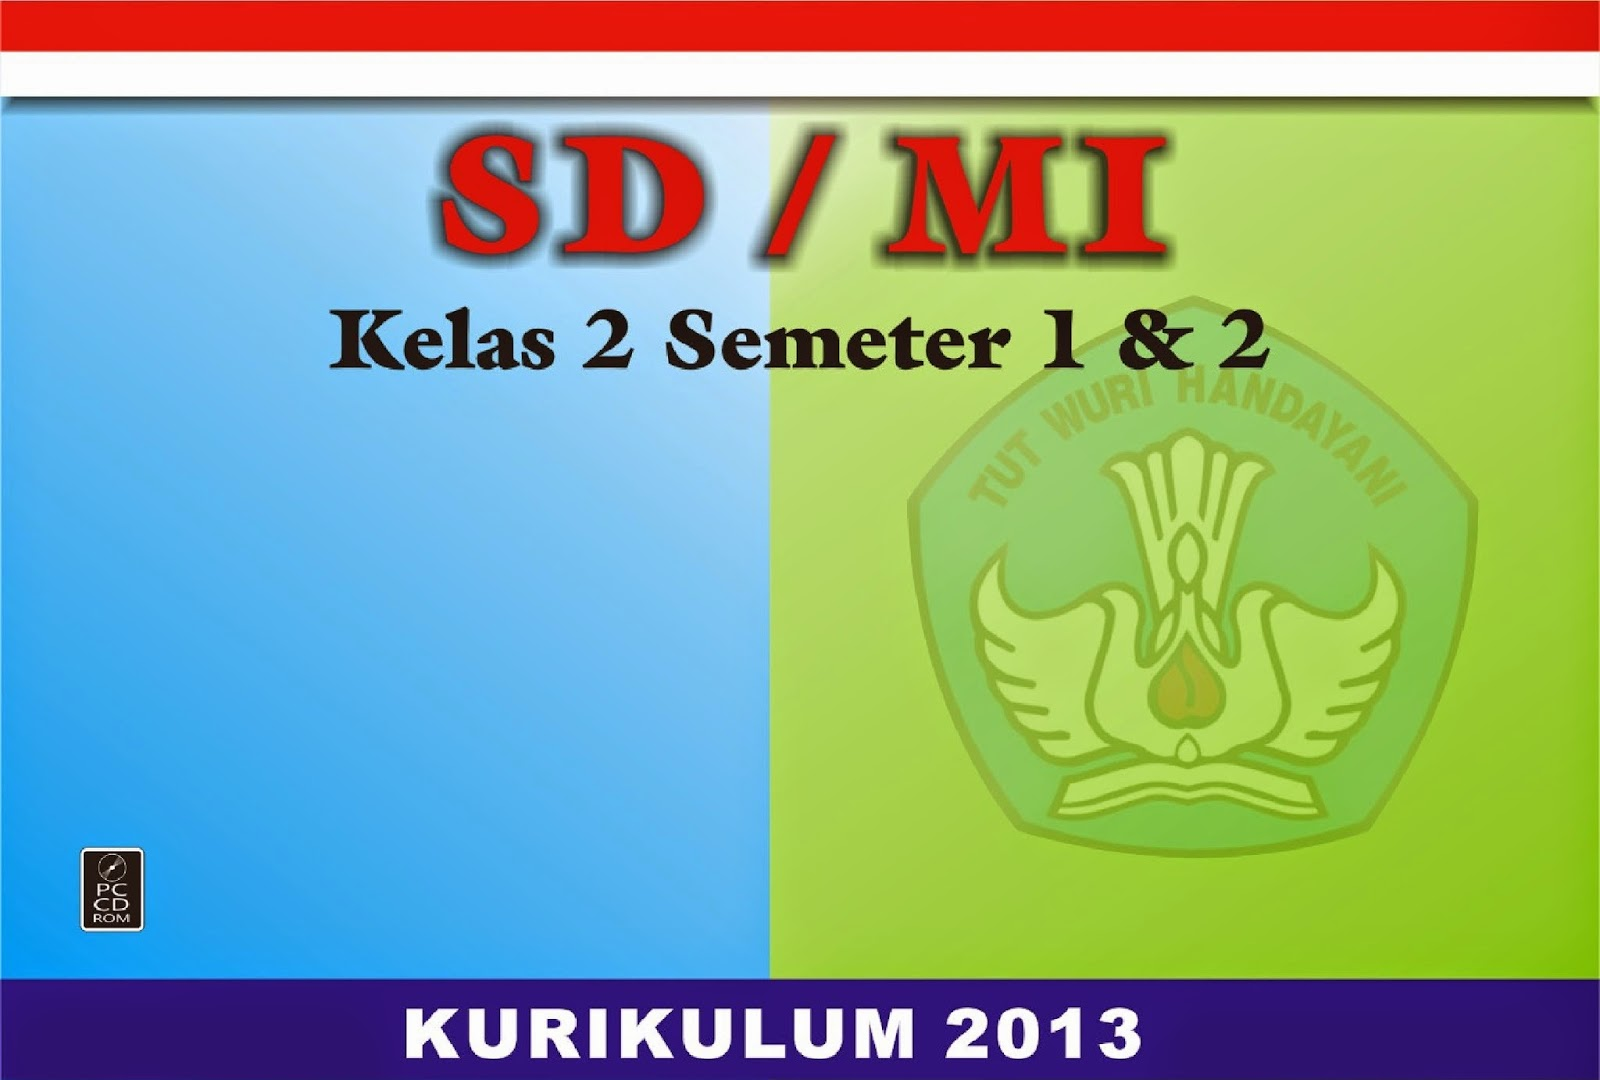 RPP Kurikulum 2013 SD/MI Kelas IV Semster 1 dan 2